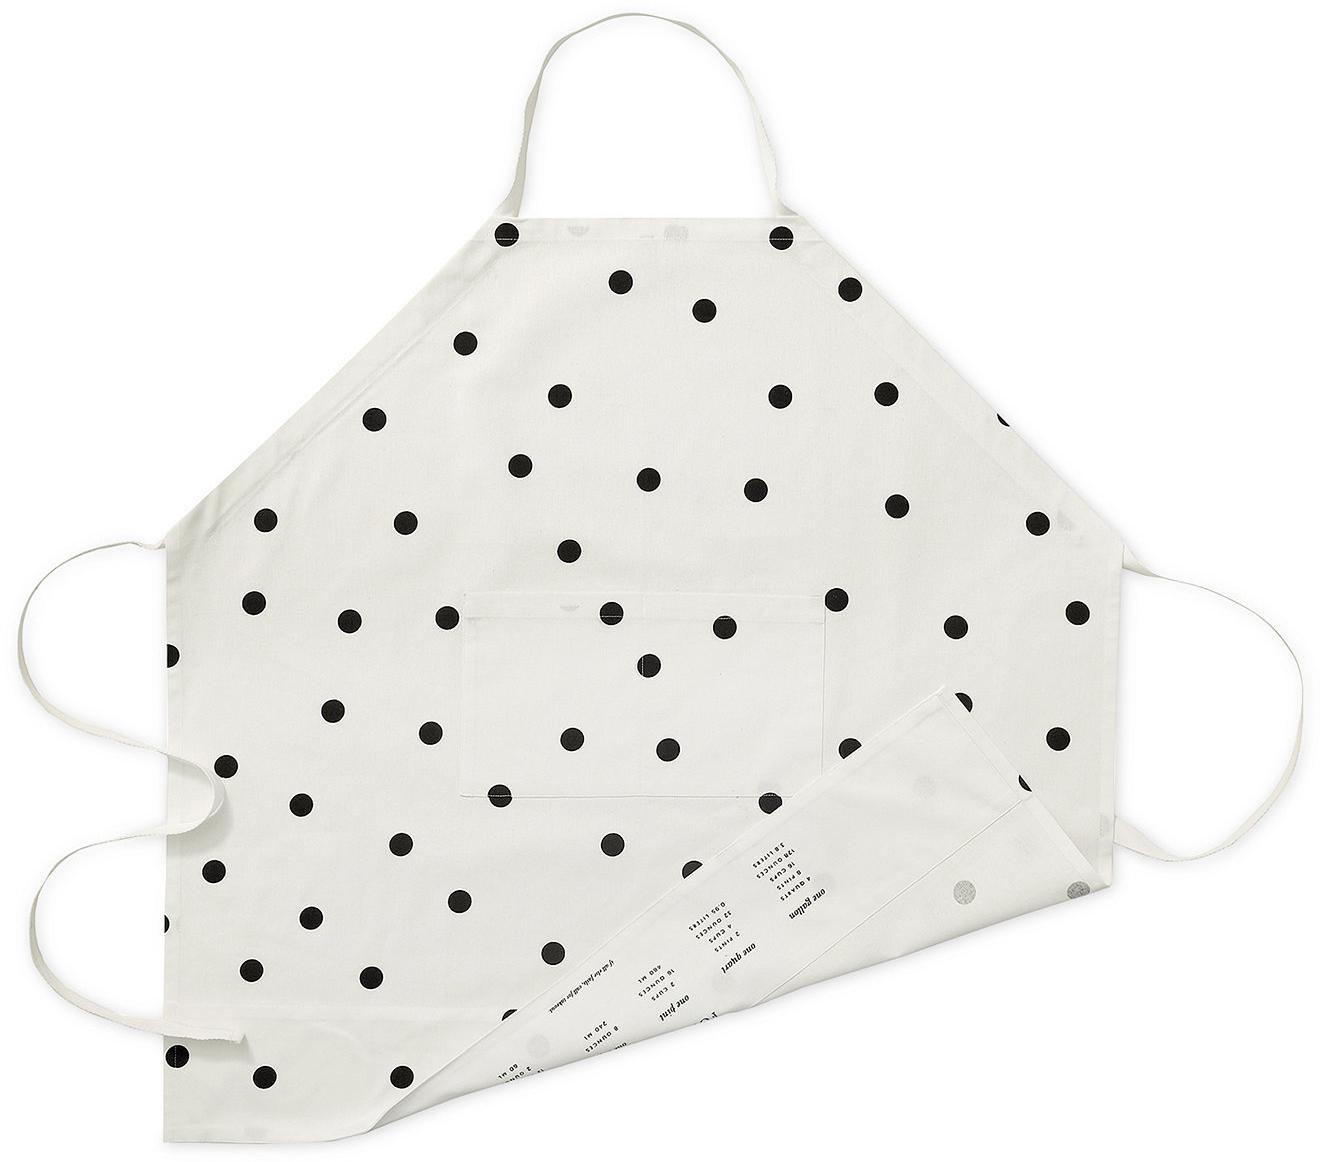 White apron macy's - Kate Spade New York All In Good Taste Polka Dot Apron Kitchen Gadgets Kitchen